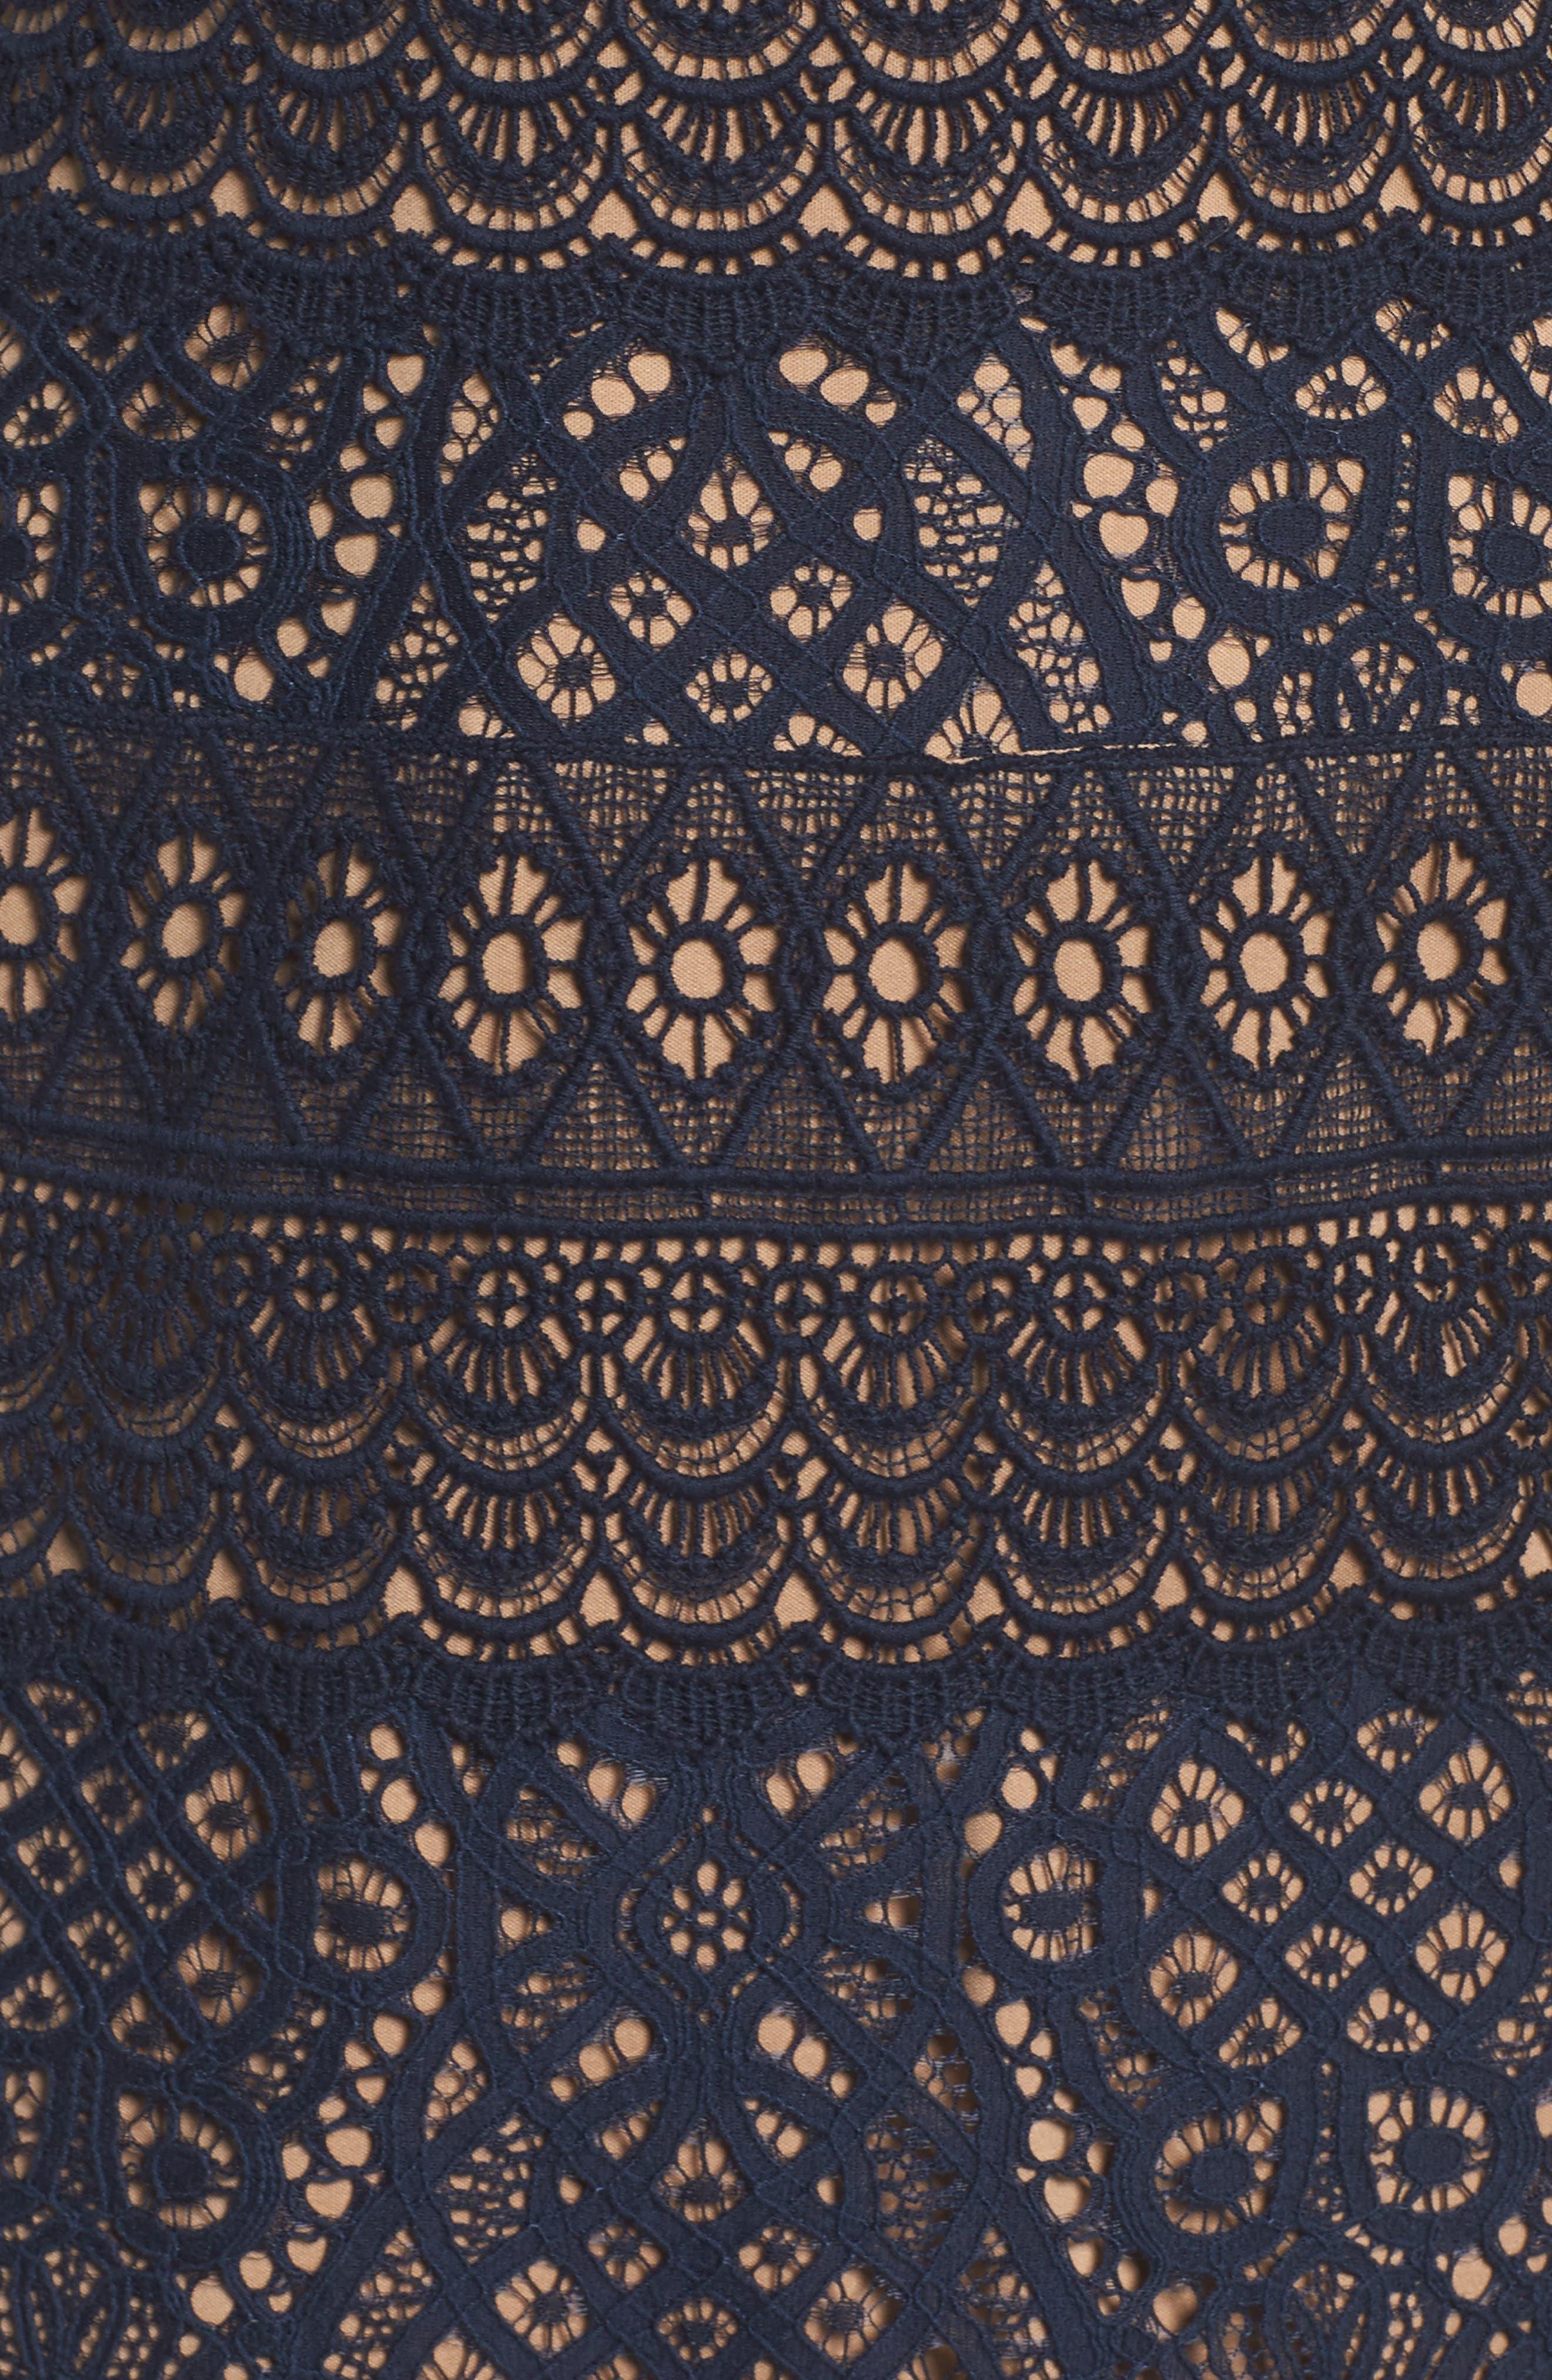 Off the Shoulder Sheath Dress,                             Alternate thumbnail 5, color,                             408